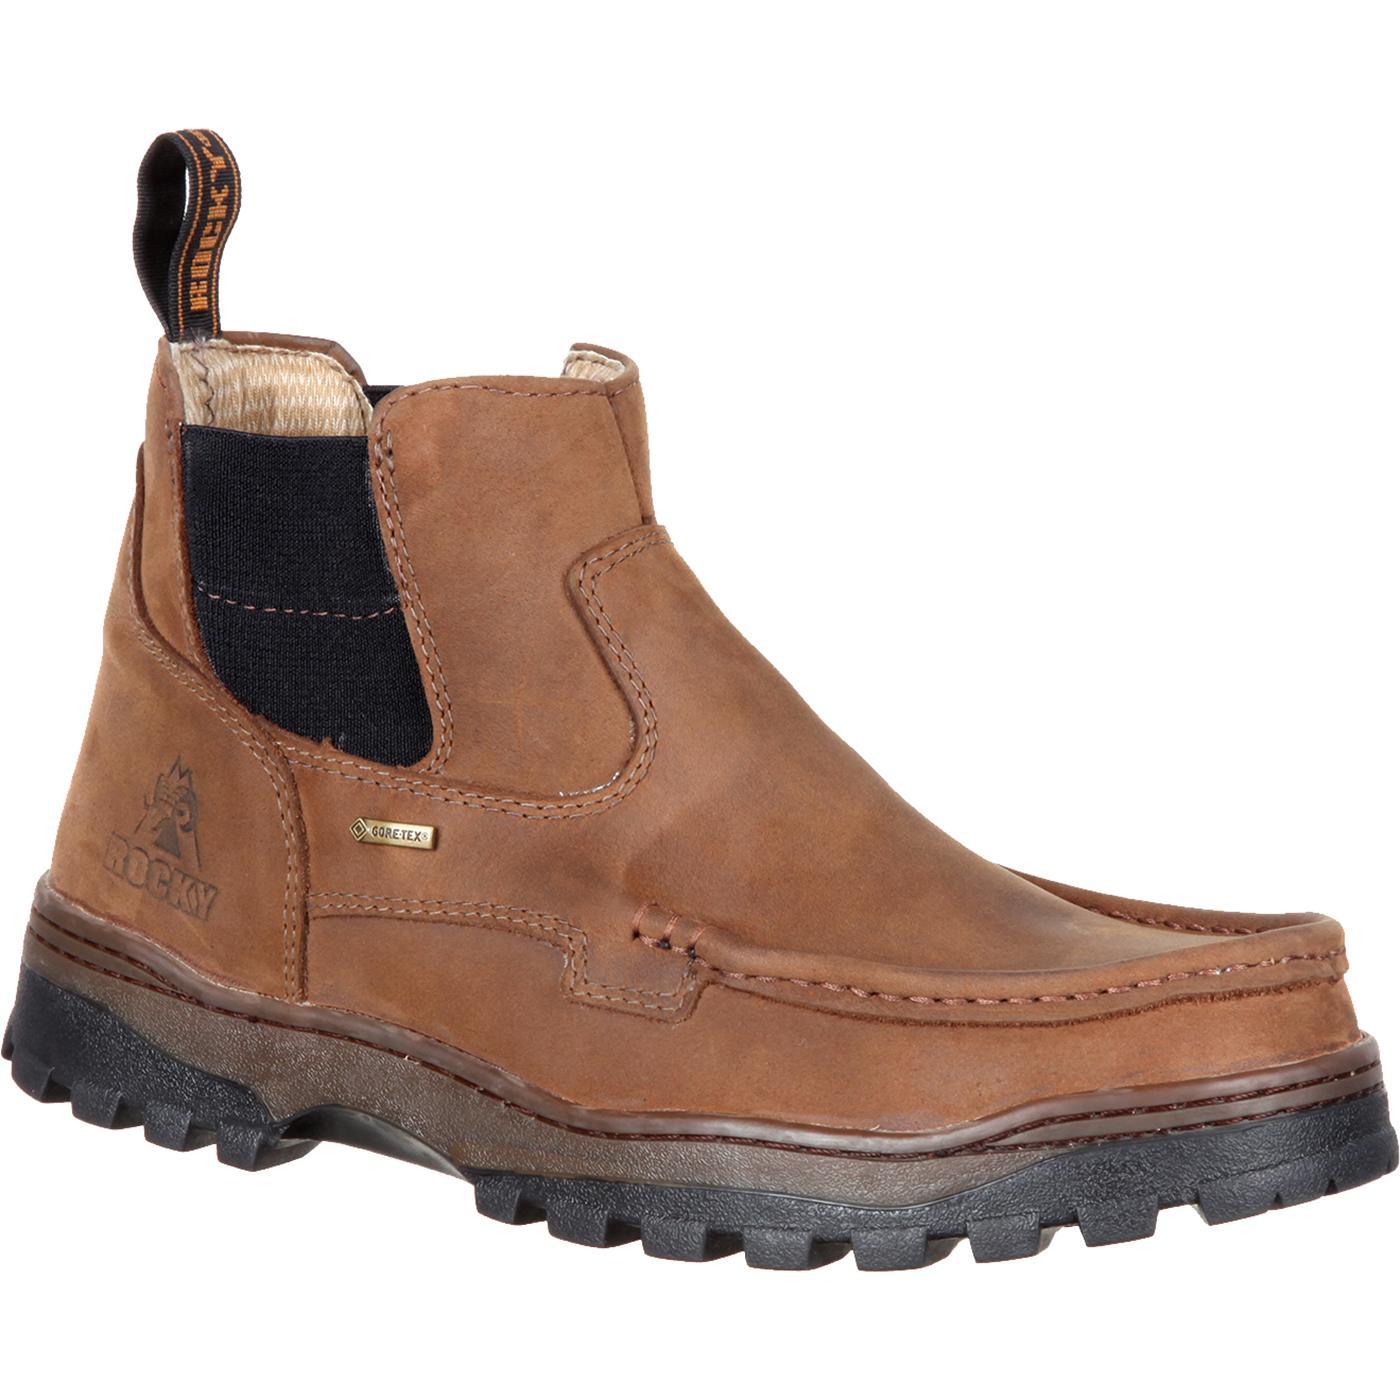 Rocky Men's Outback GORE-TEX® Waterproof Hiker Boot-RKS0310